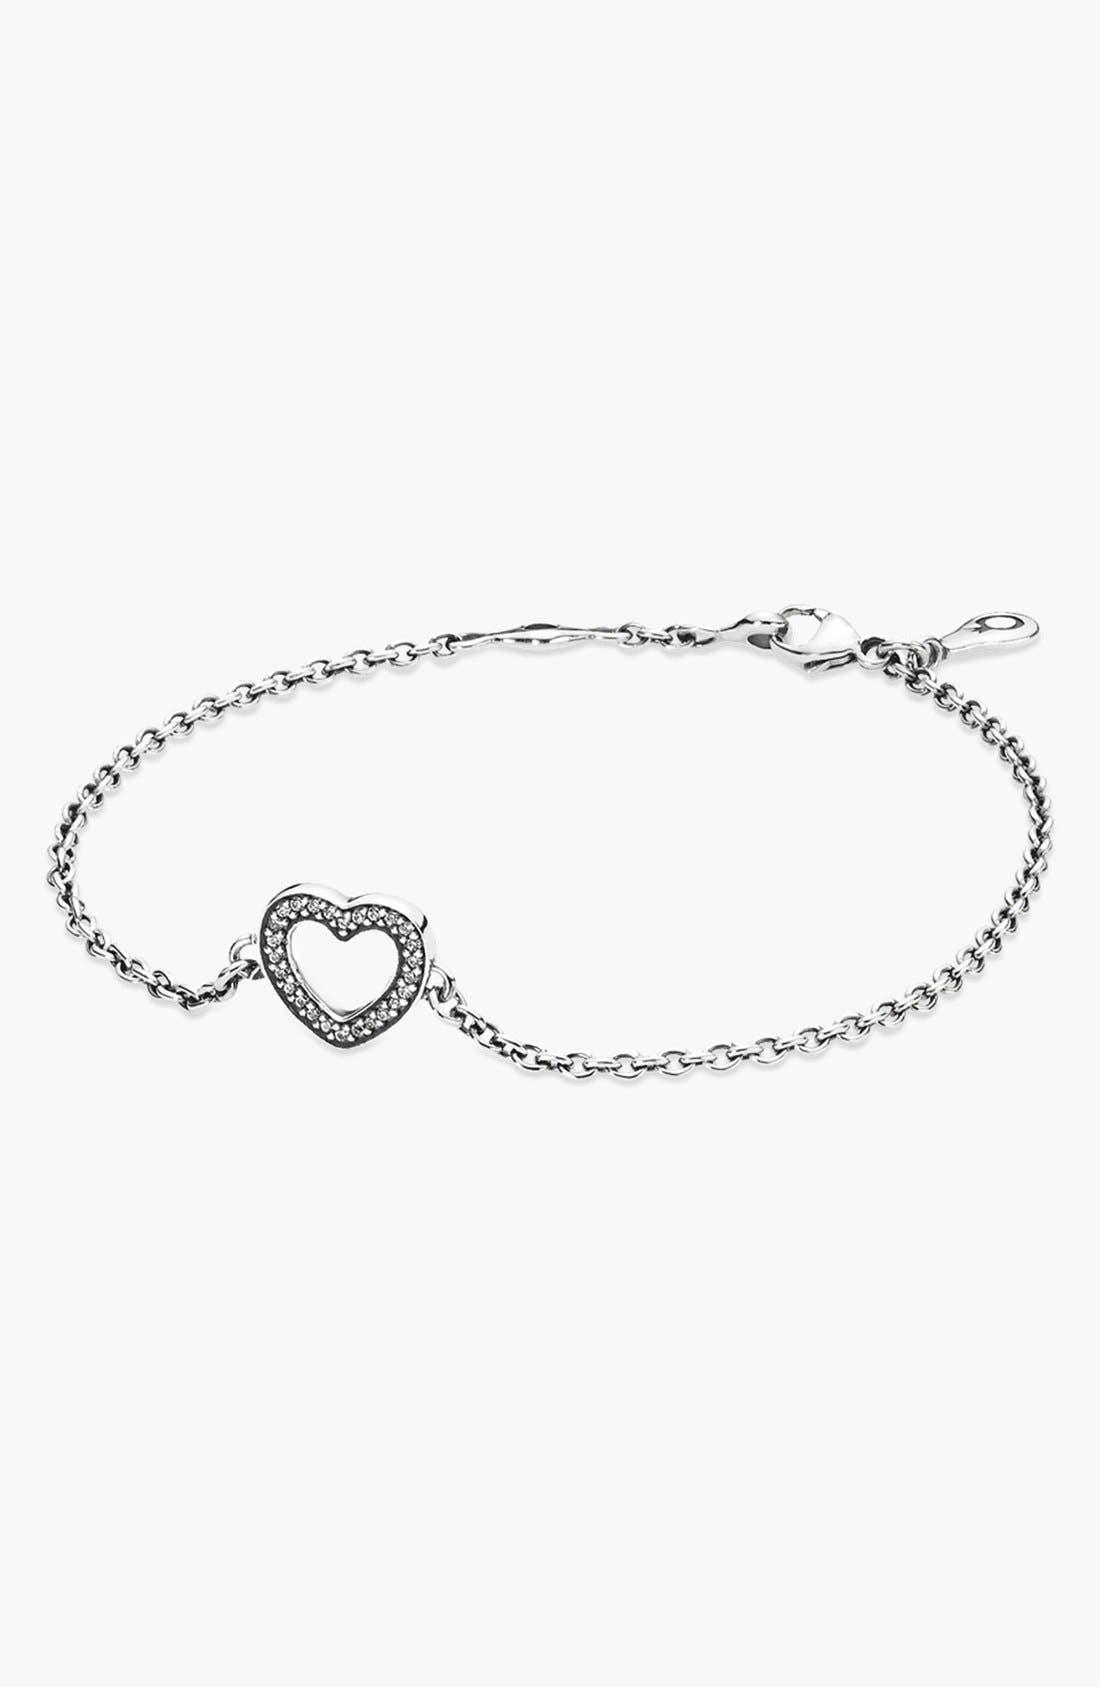 Main Image - SYMBOL OF LOVE HEART BRACELET